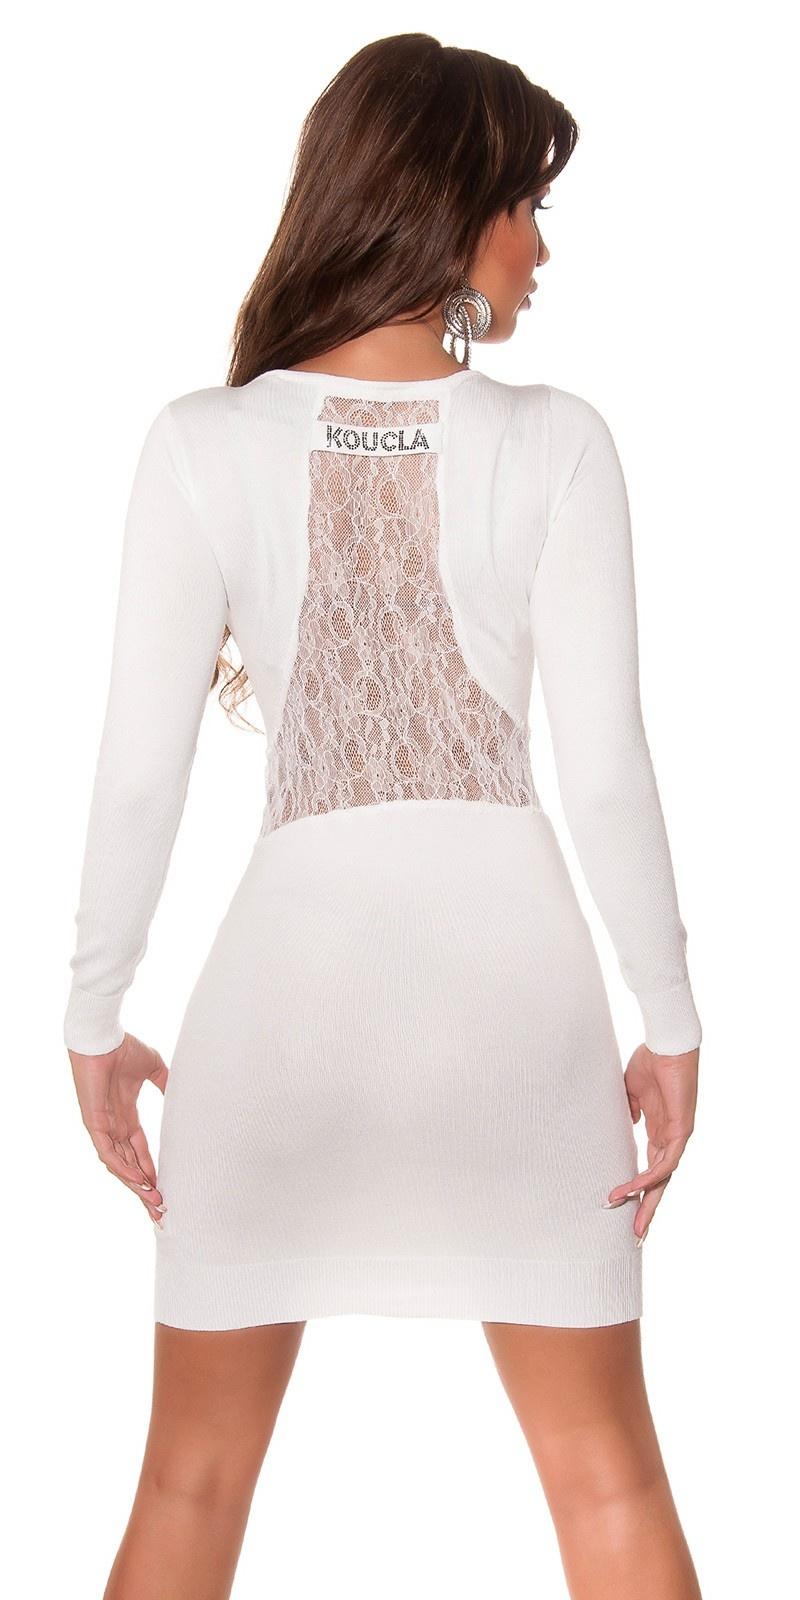 Trendy gebreide jurk open rug met kant wit